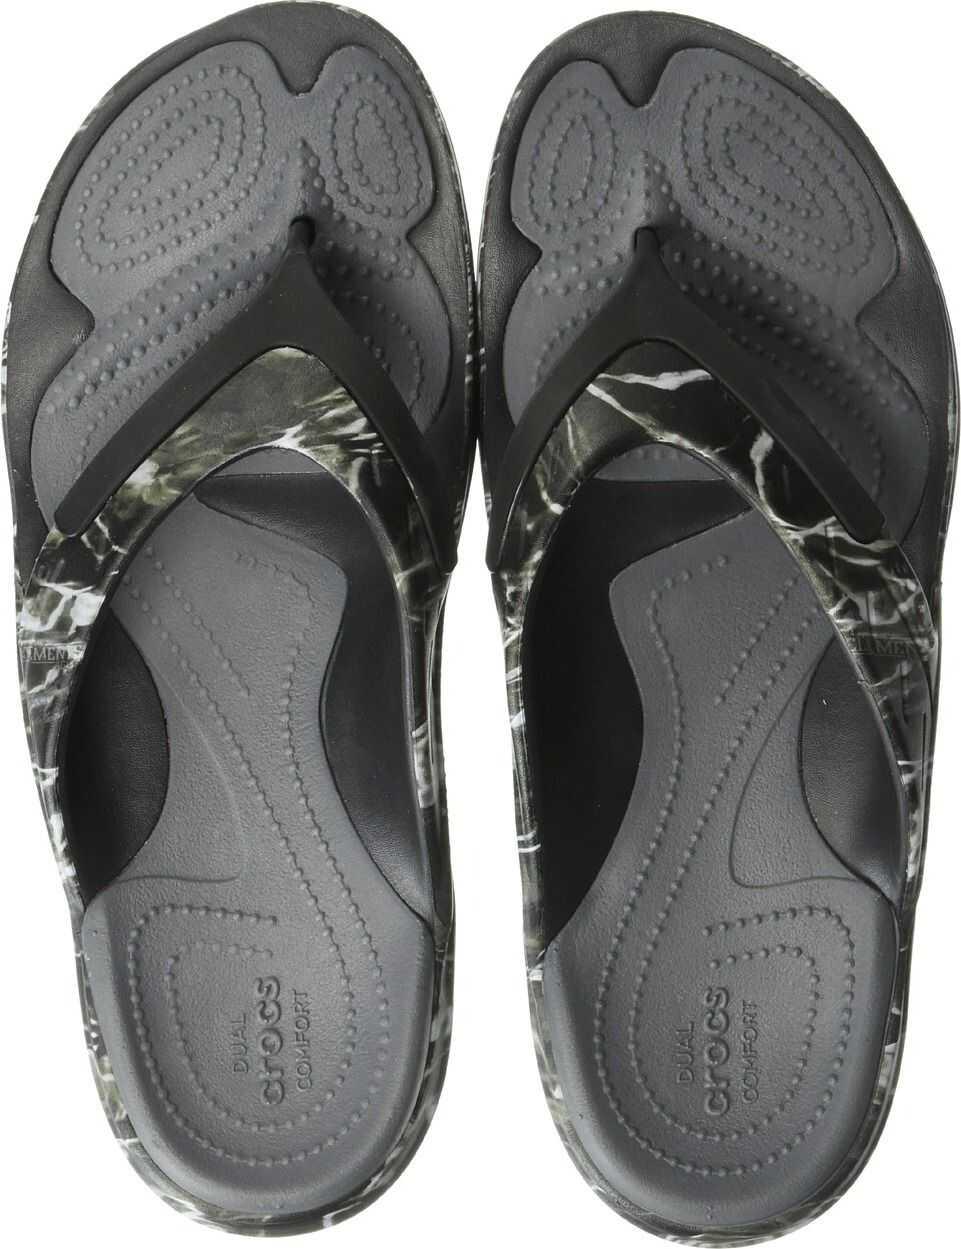 Crocs Modi Sport Mossy Oak Elements Black